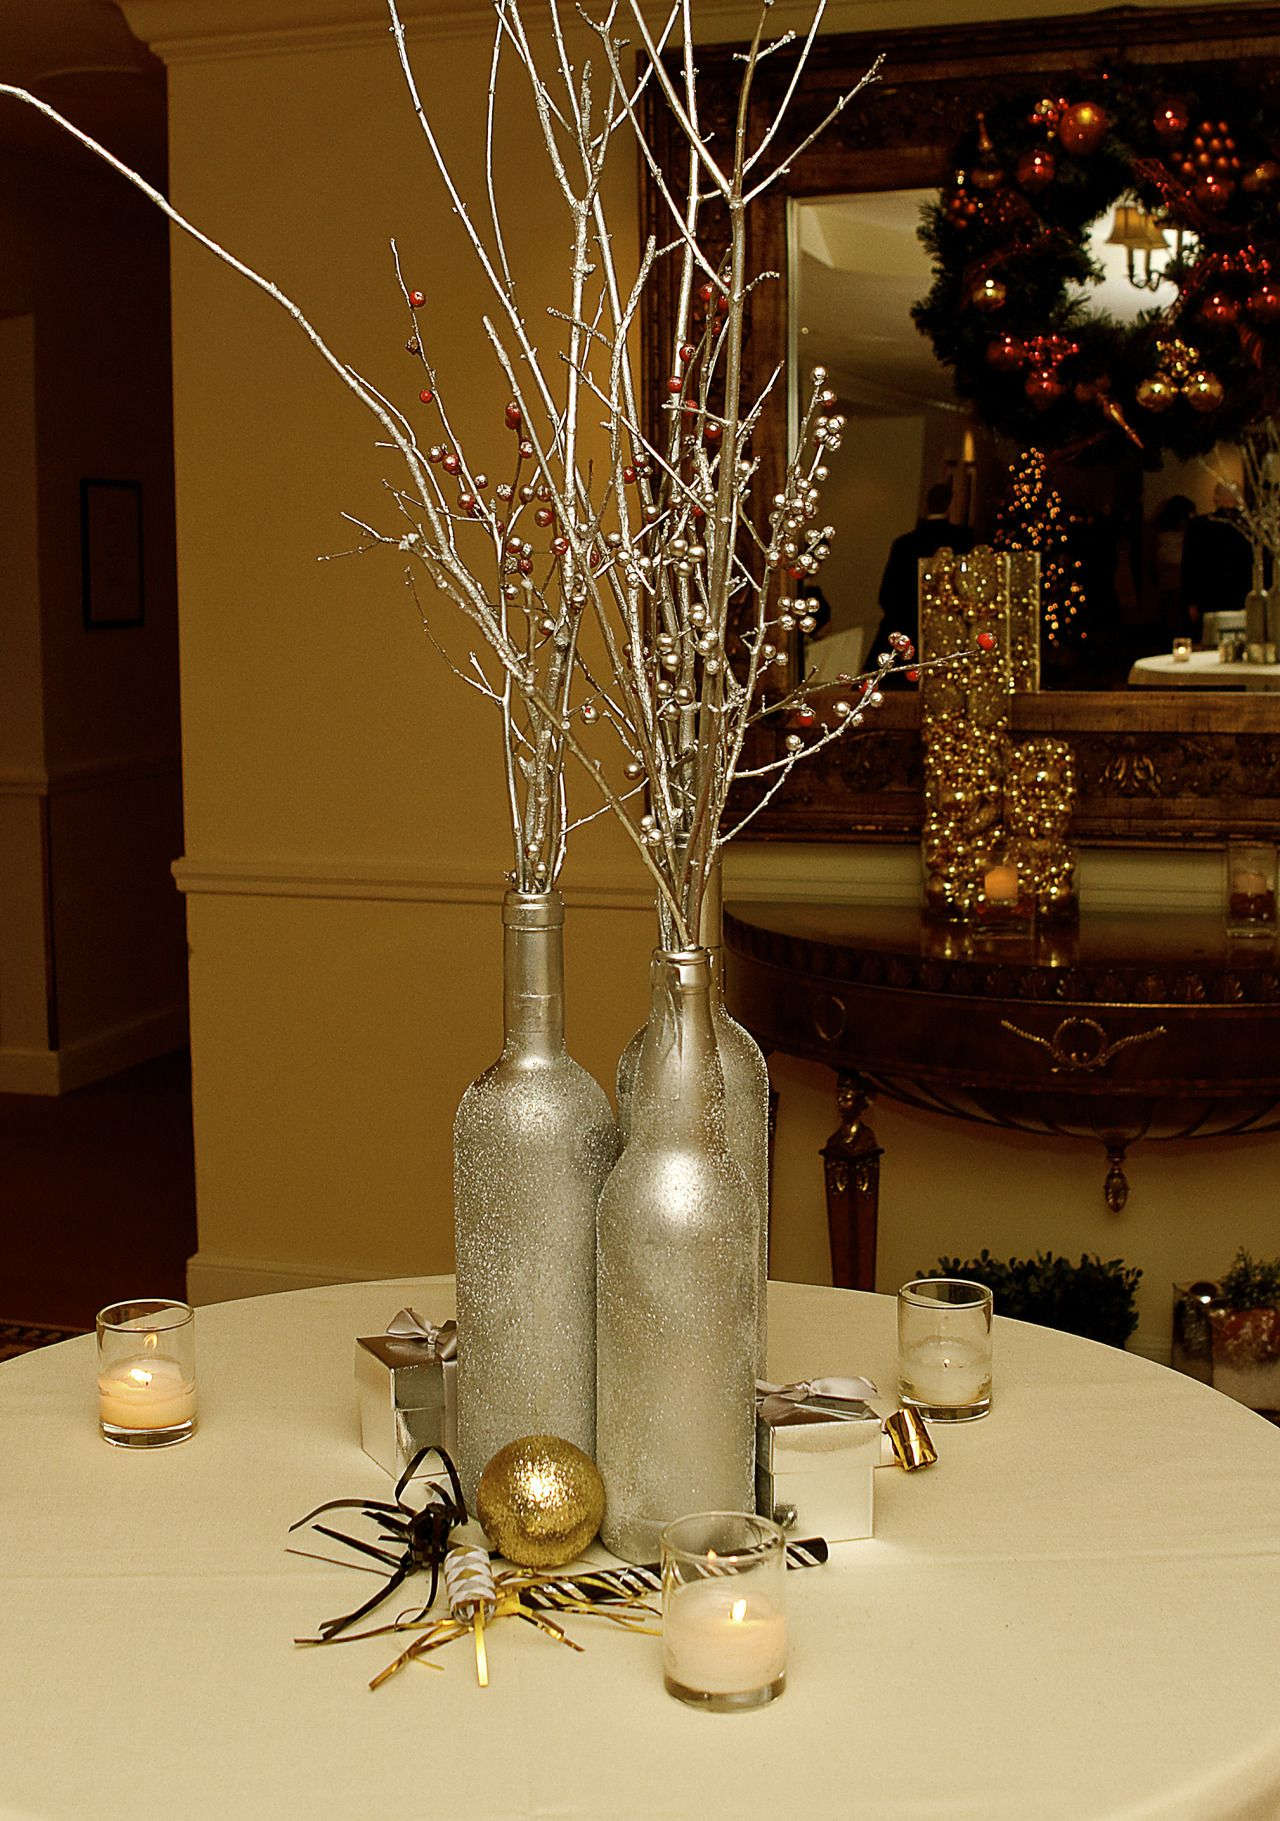 wine bottle centerpieces for wedding - Bing images | Wine bottles ...